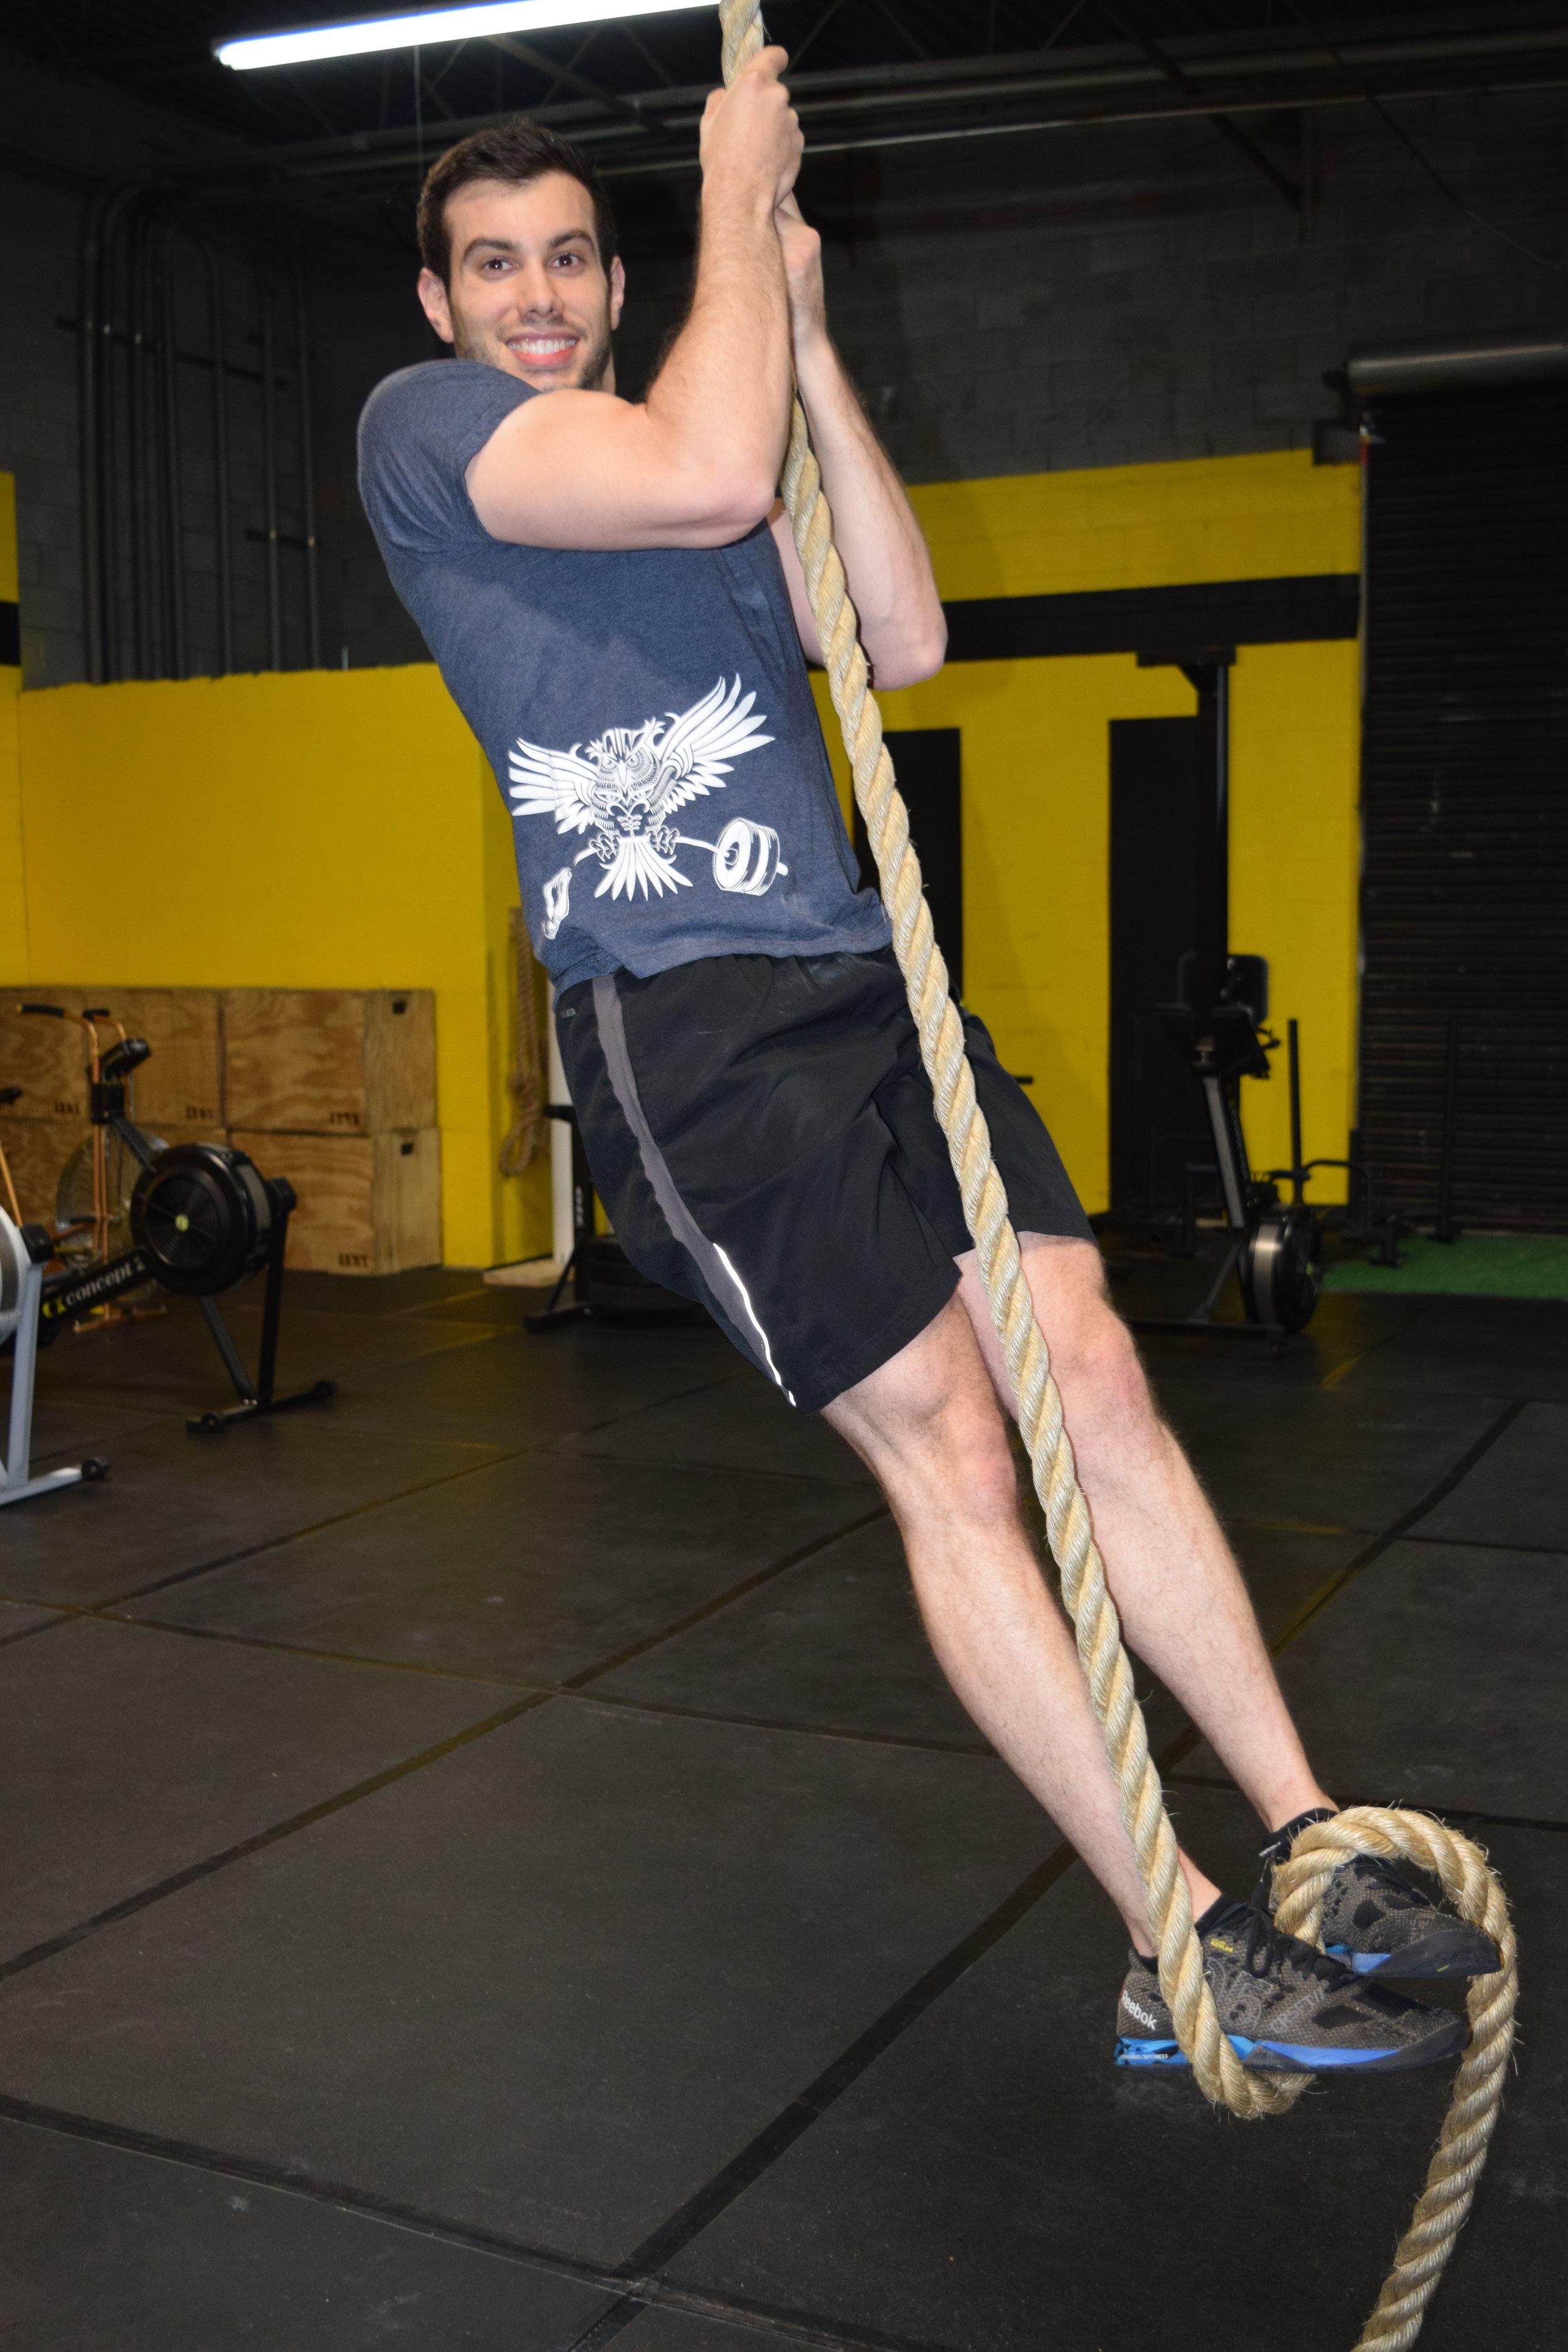 Rope Climb Smiles